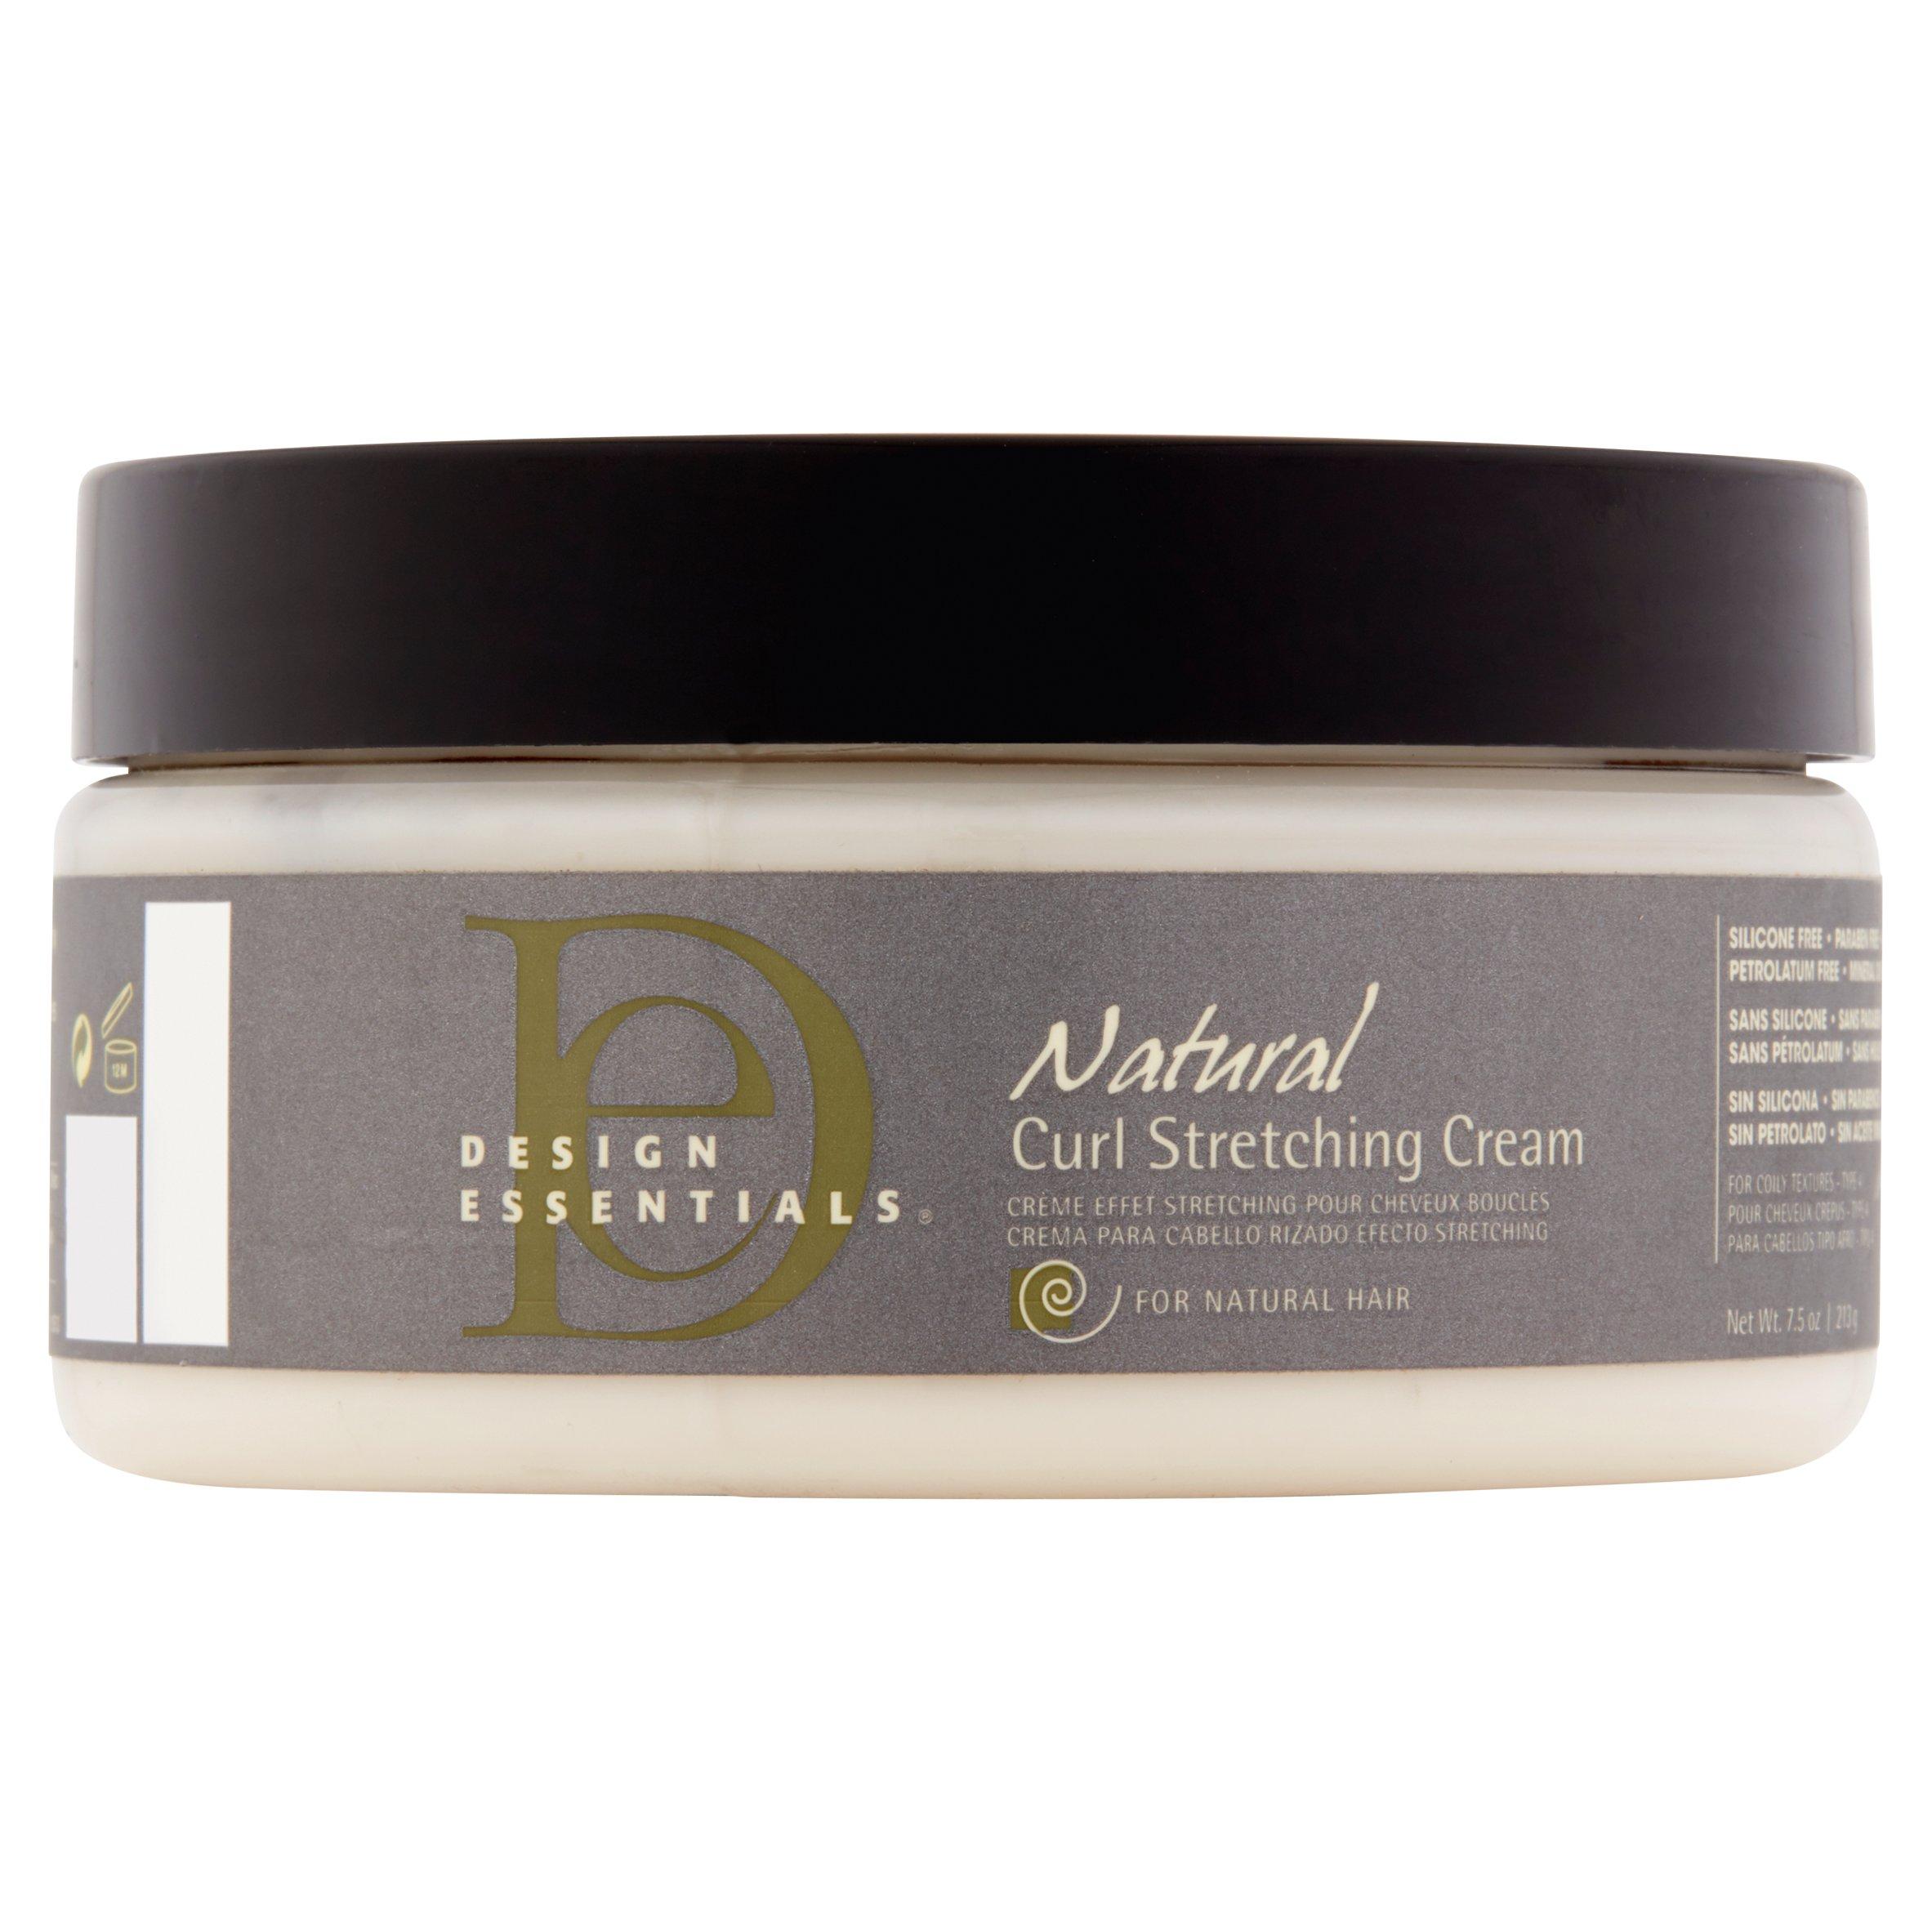 Design Essentials Natural Curl Stretching Cream 75 Oz Walmartcom